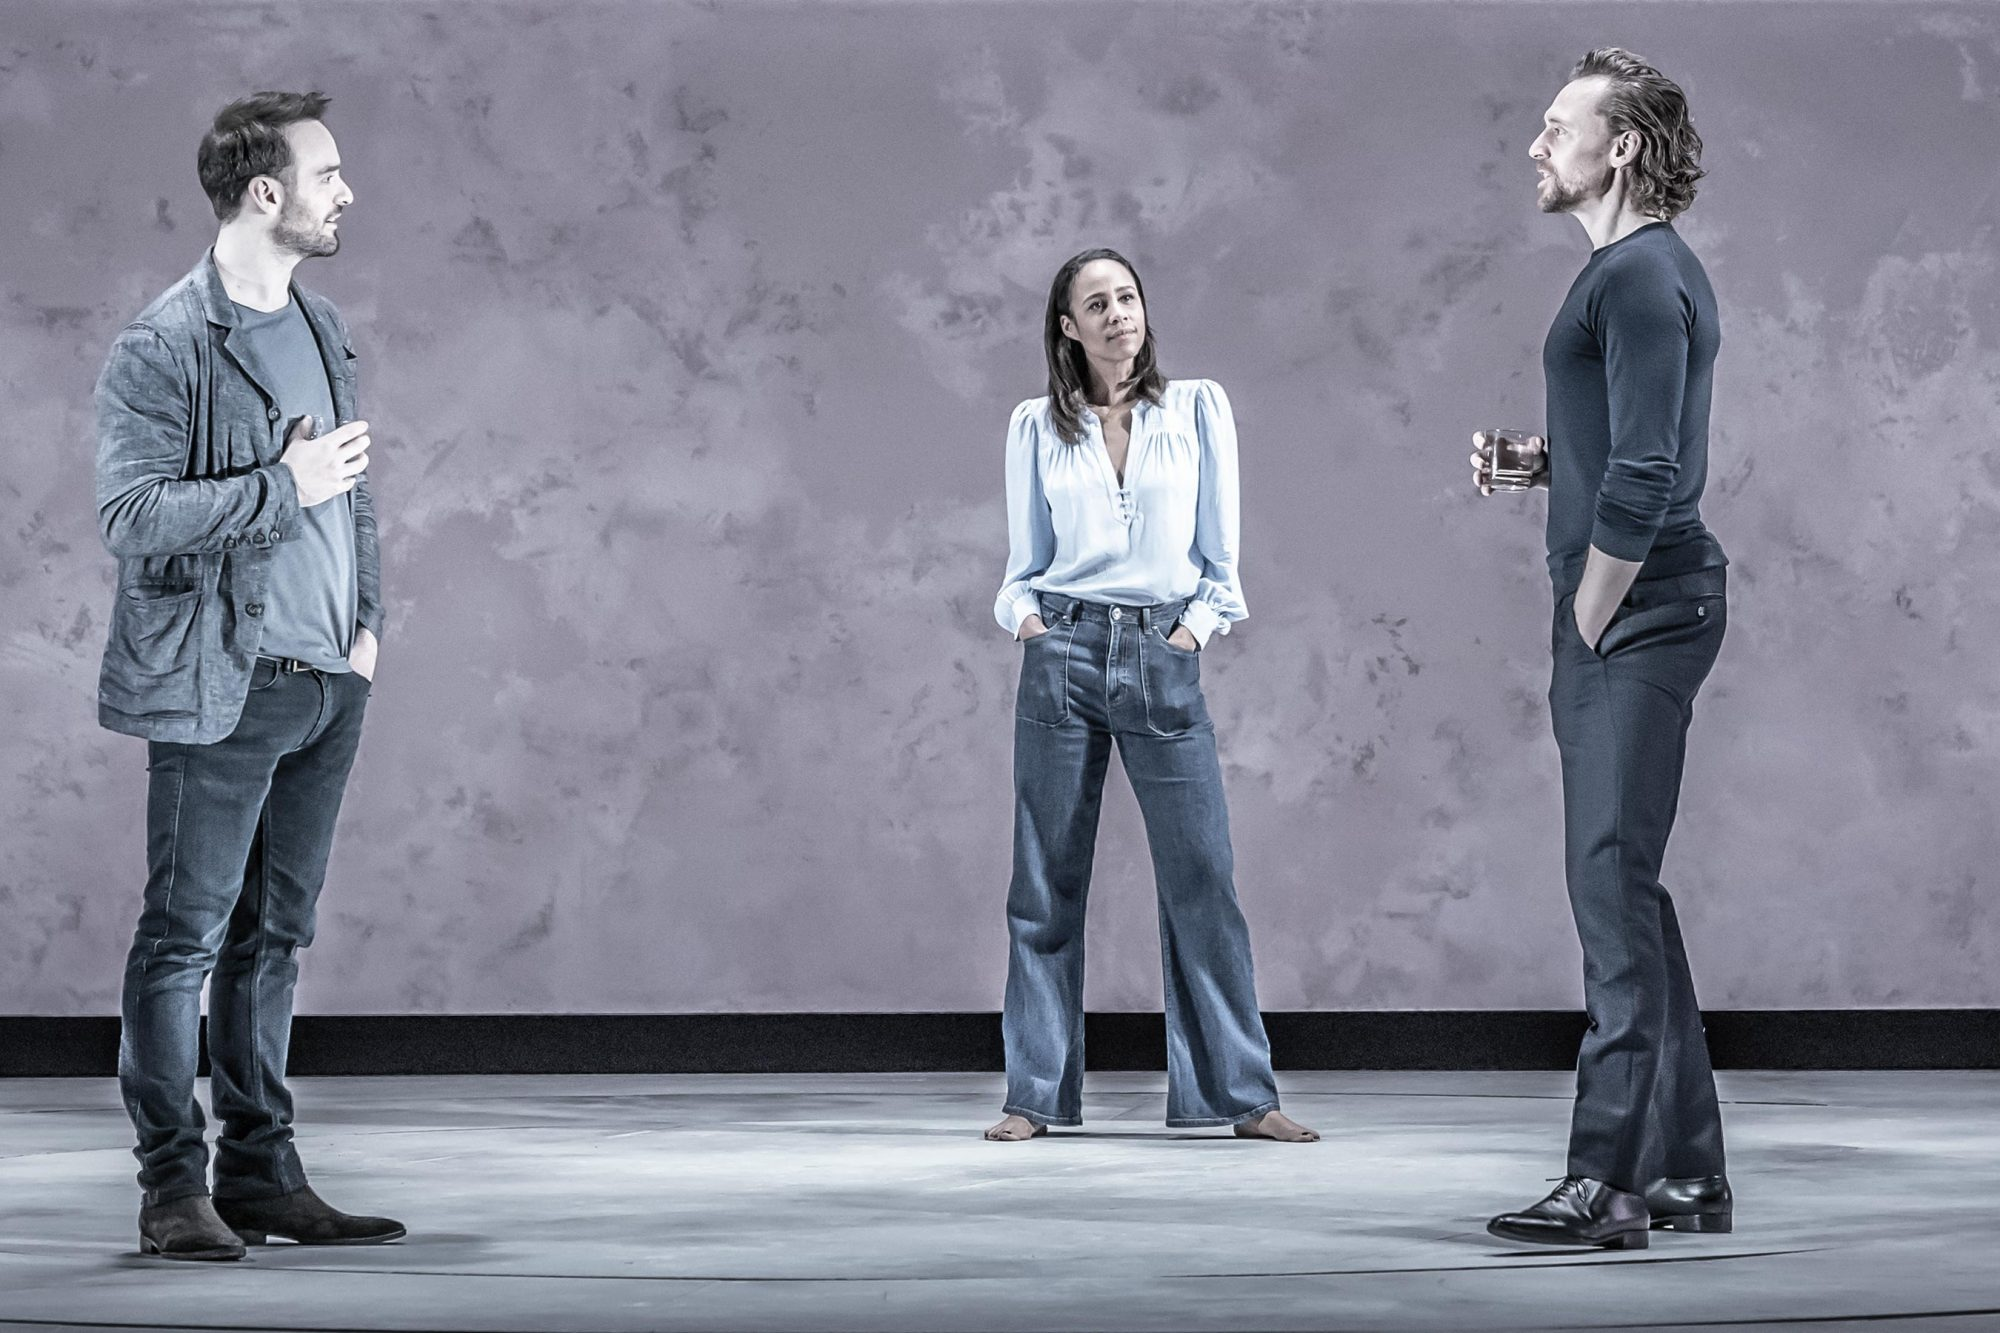 Betrayal Charlie Cox, Zawe Ashton, and Tom Hiddleston CR: Marc Brenner